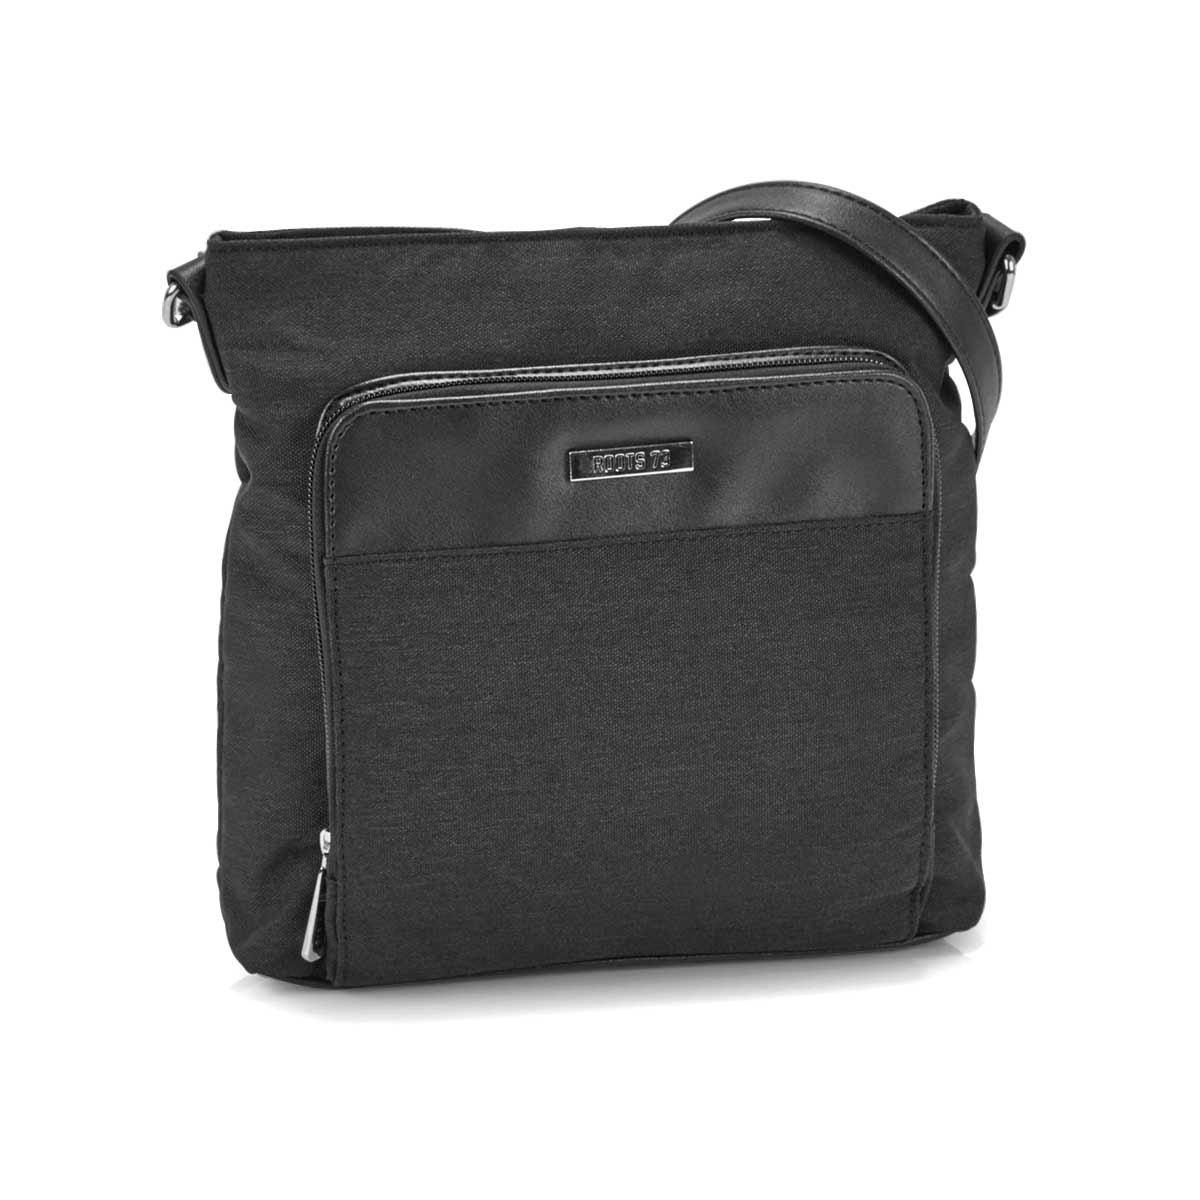 Women's R5184 black crossbody bag